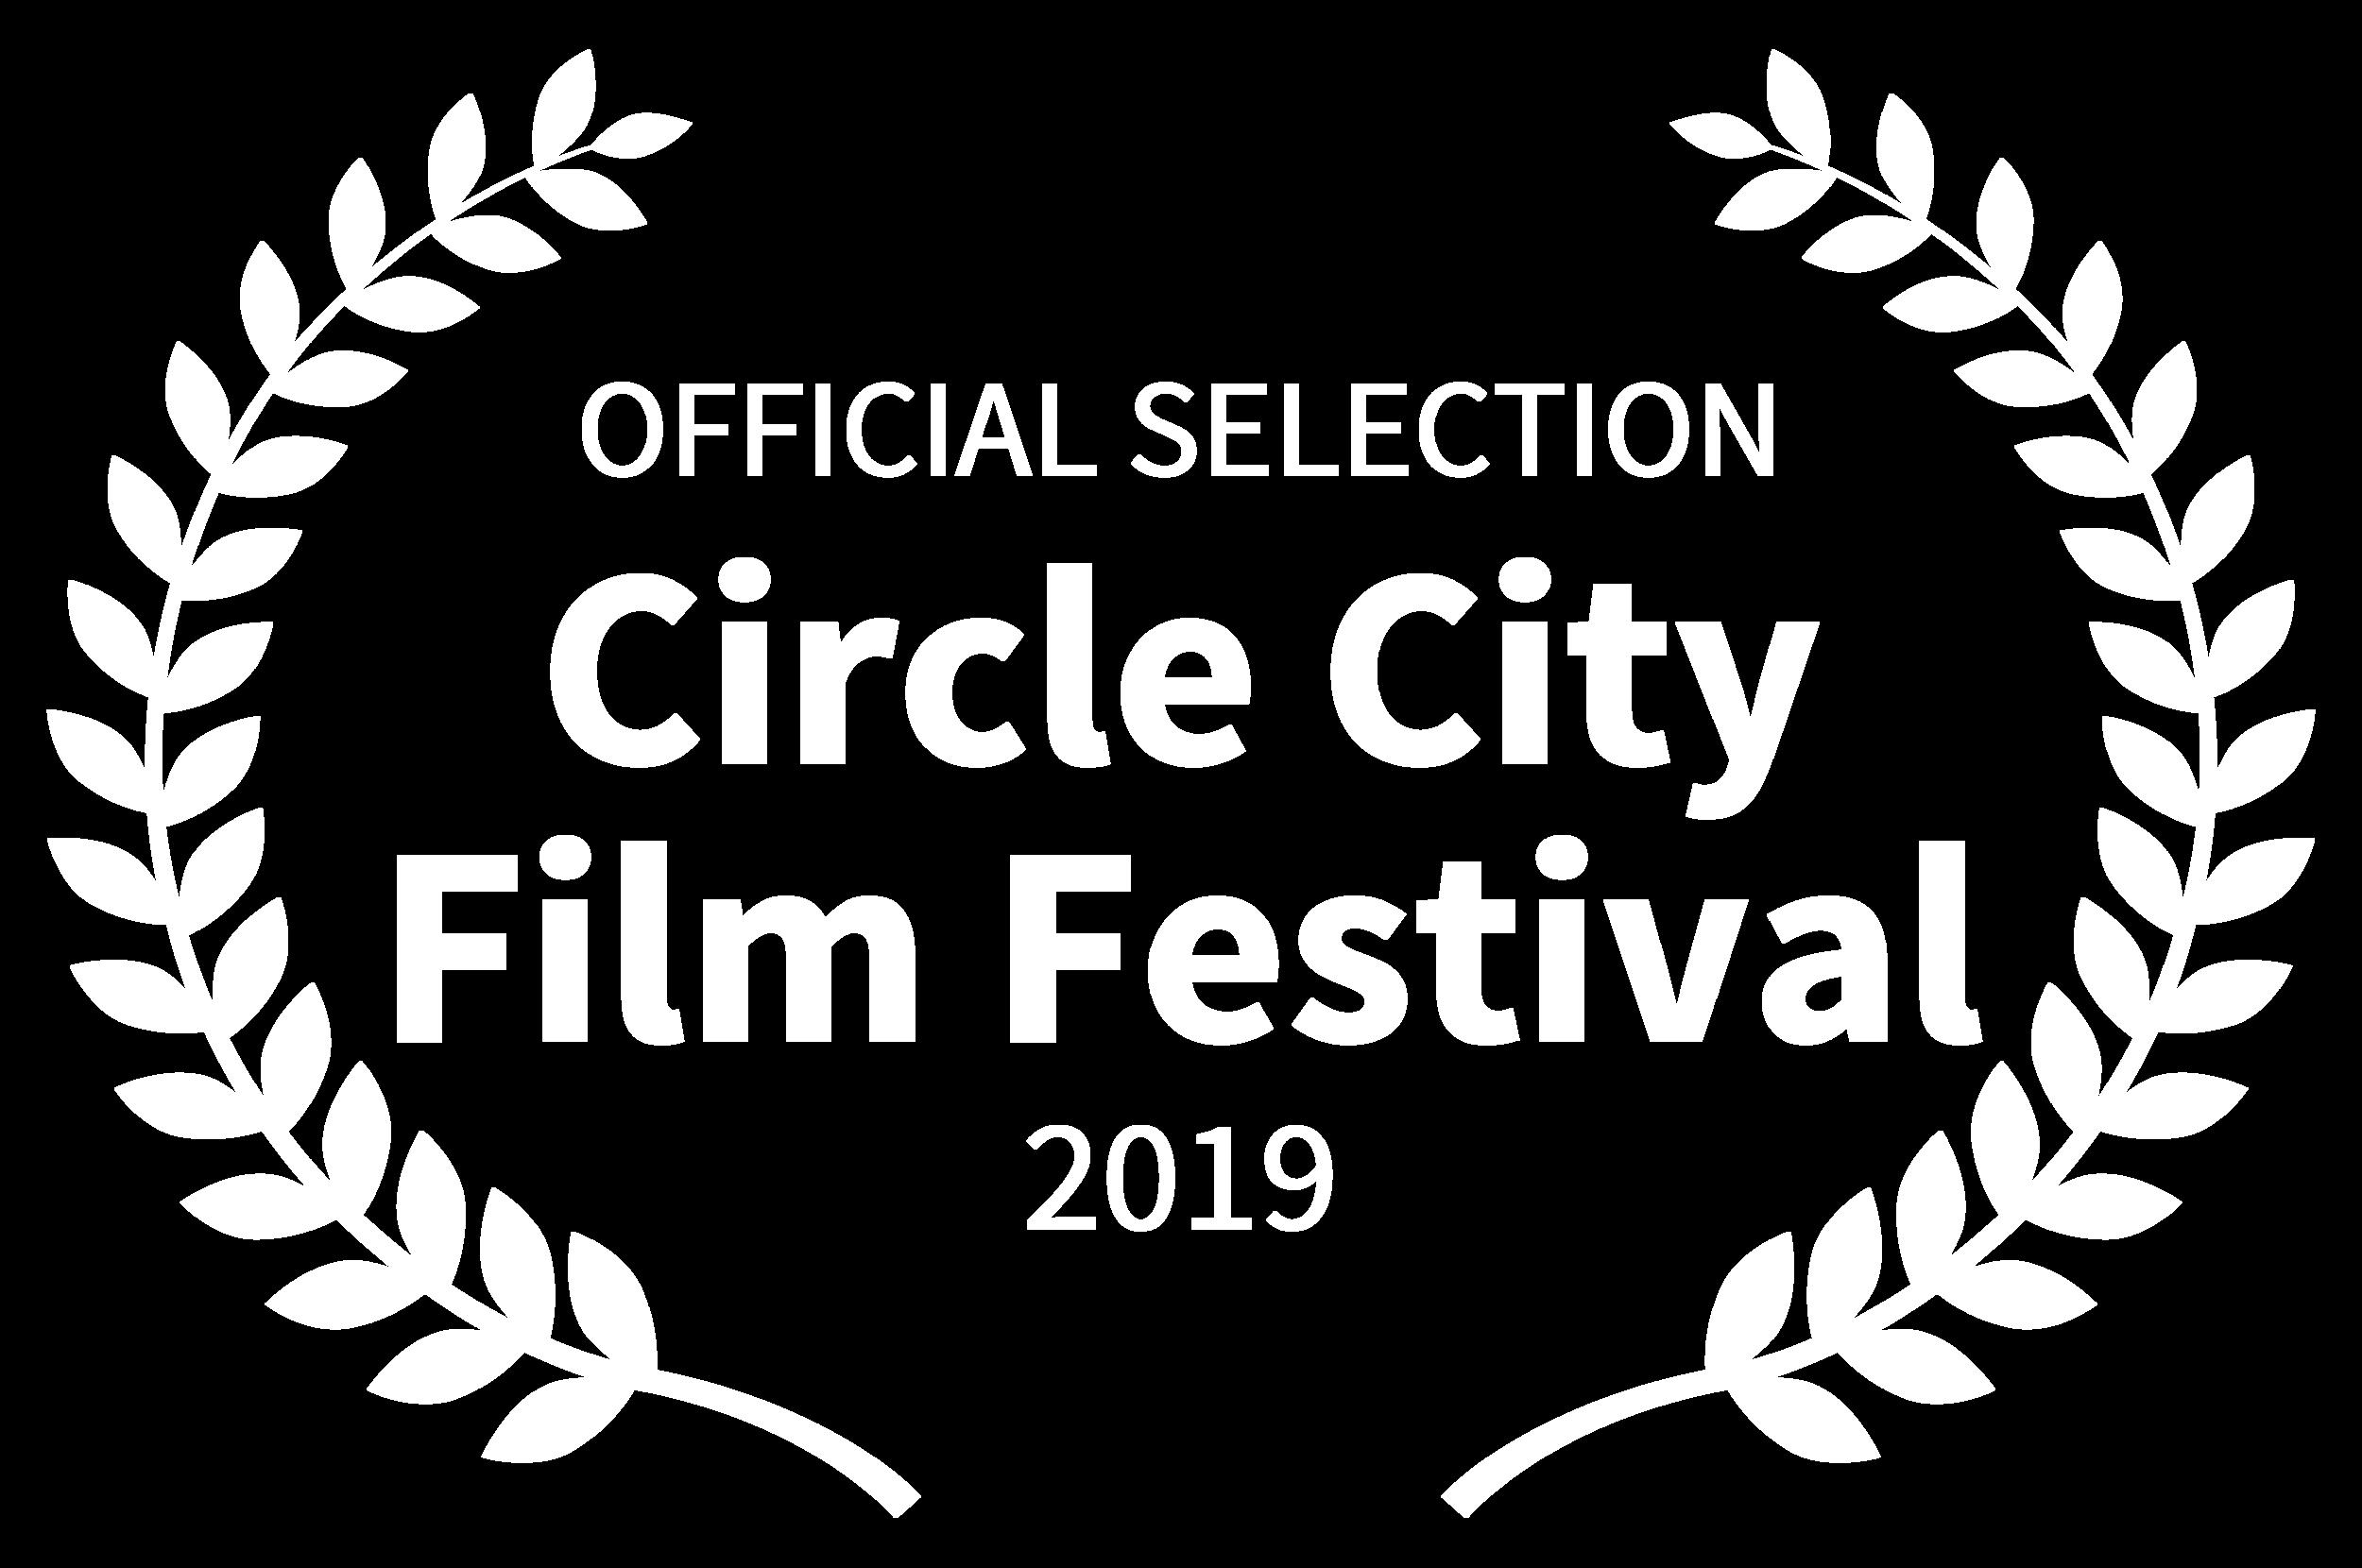 OFFICIALSELECTION-CircleCityFilmFestival-2019 (1).png